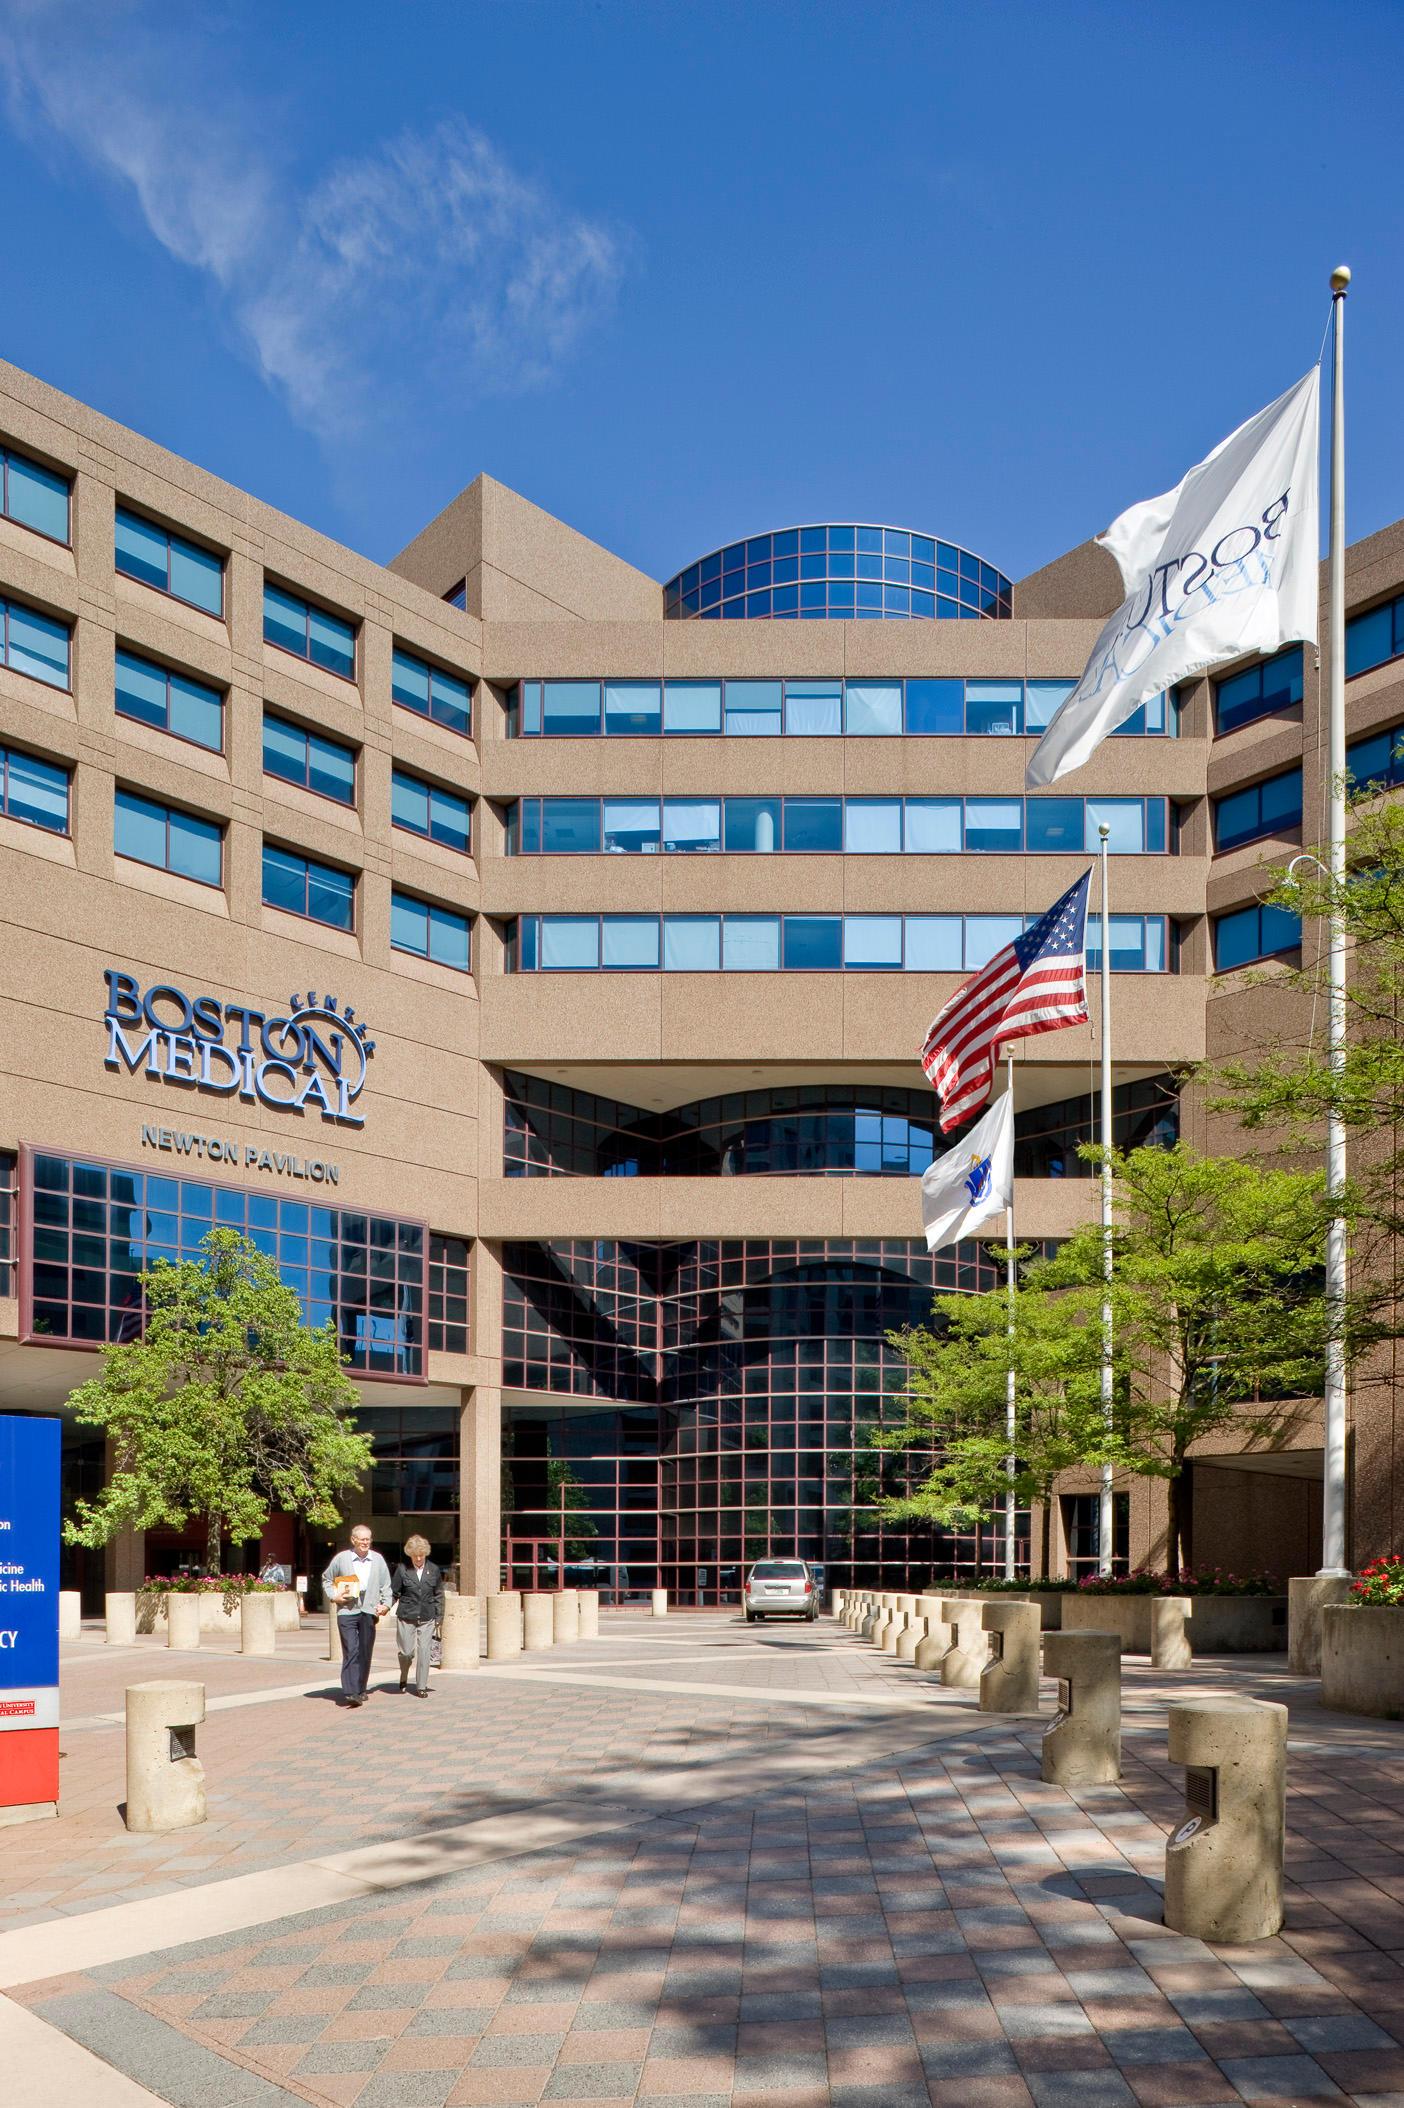 Newton Pavilion at Boston Medical Center